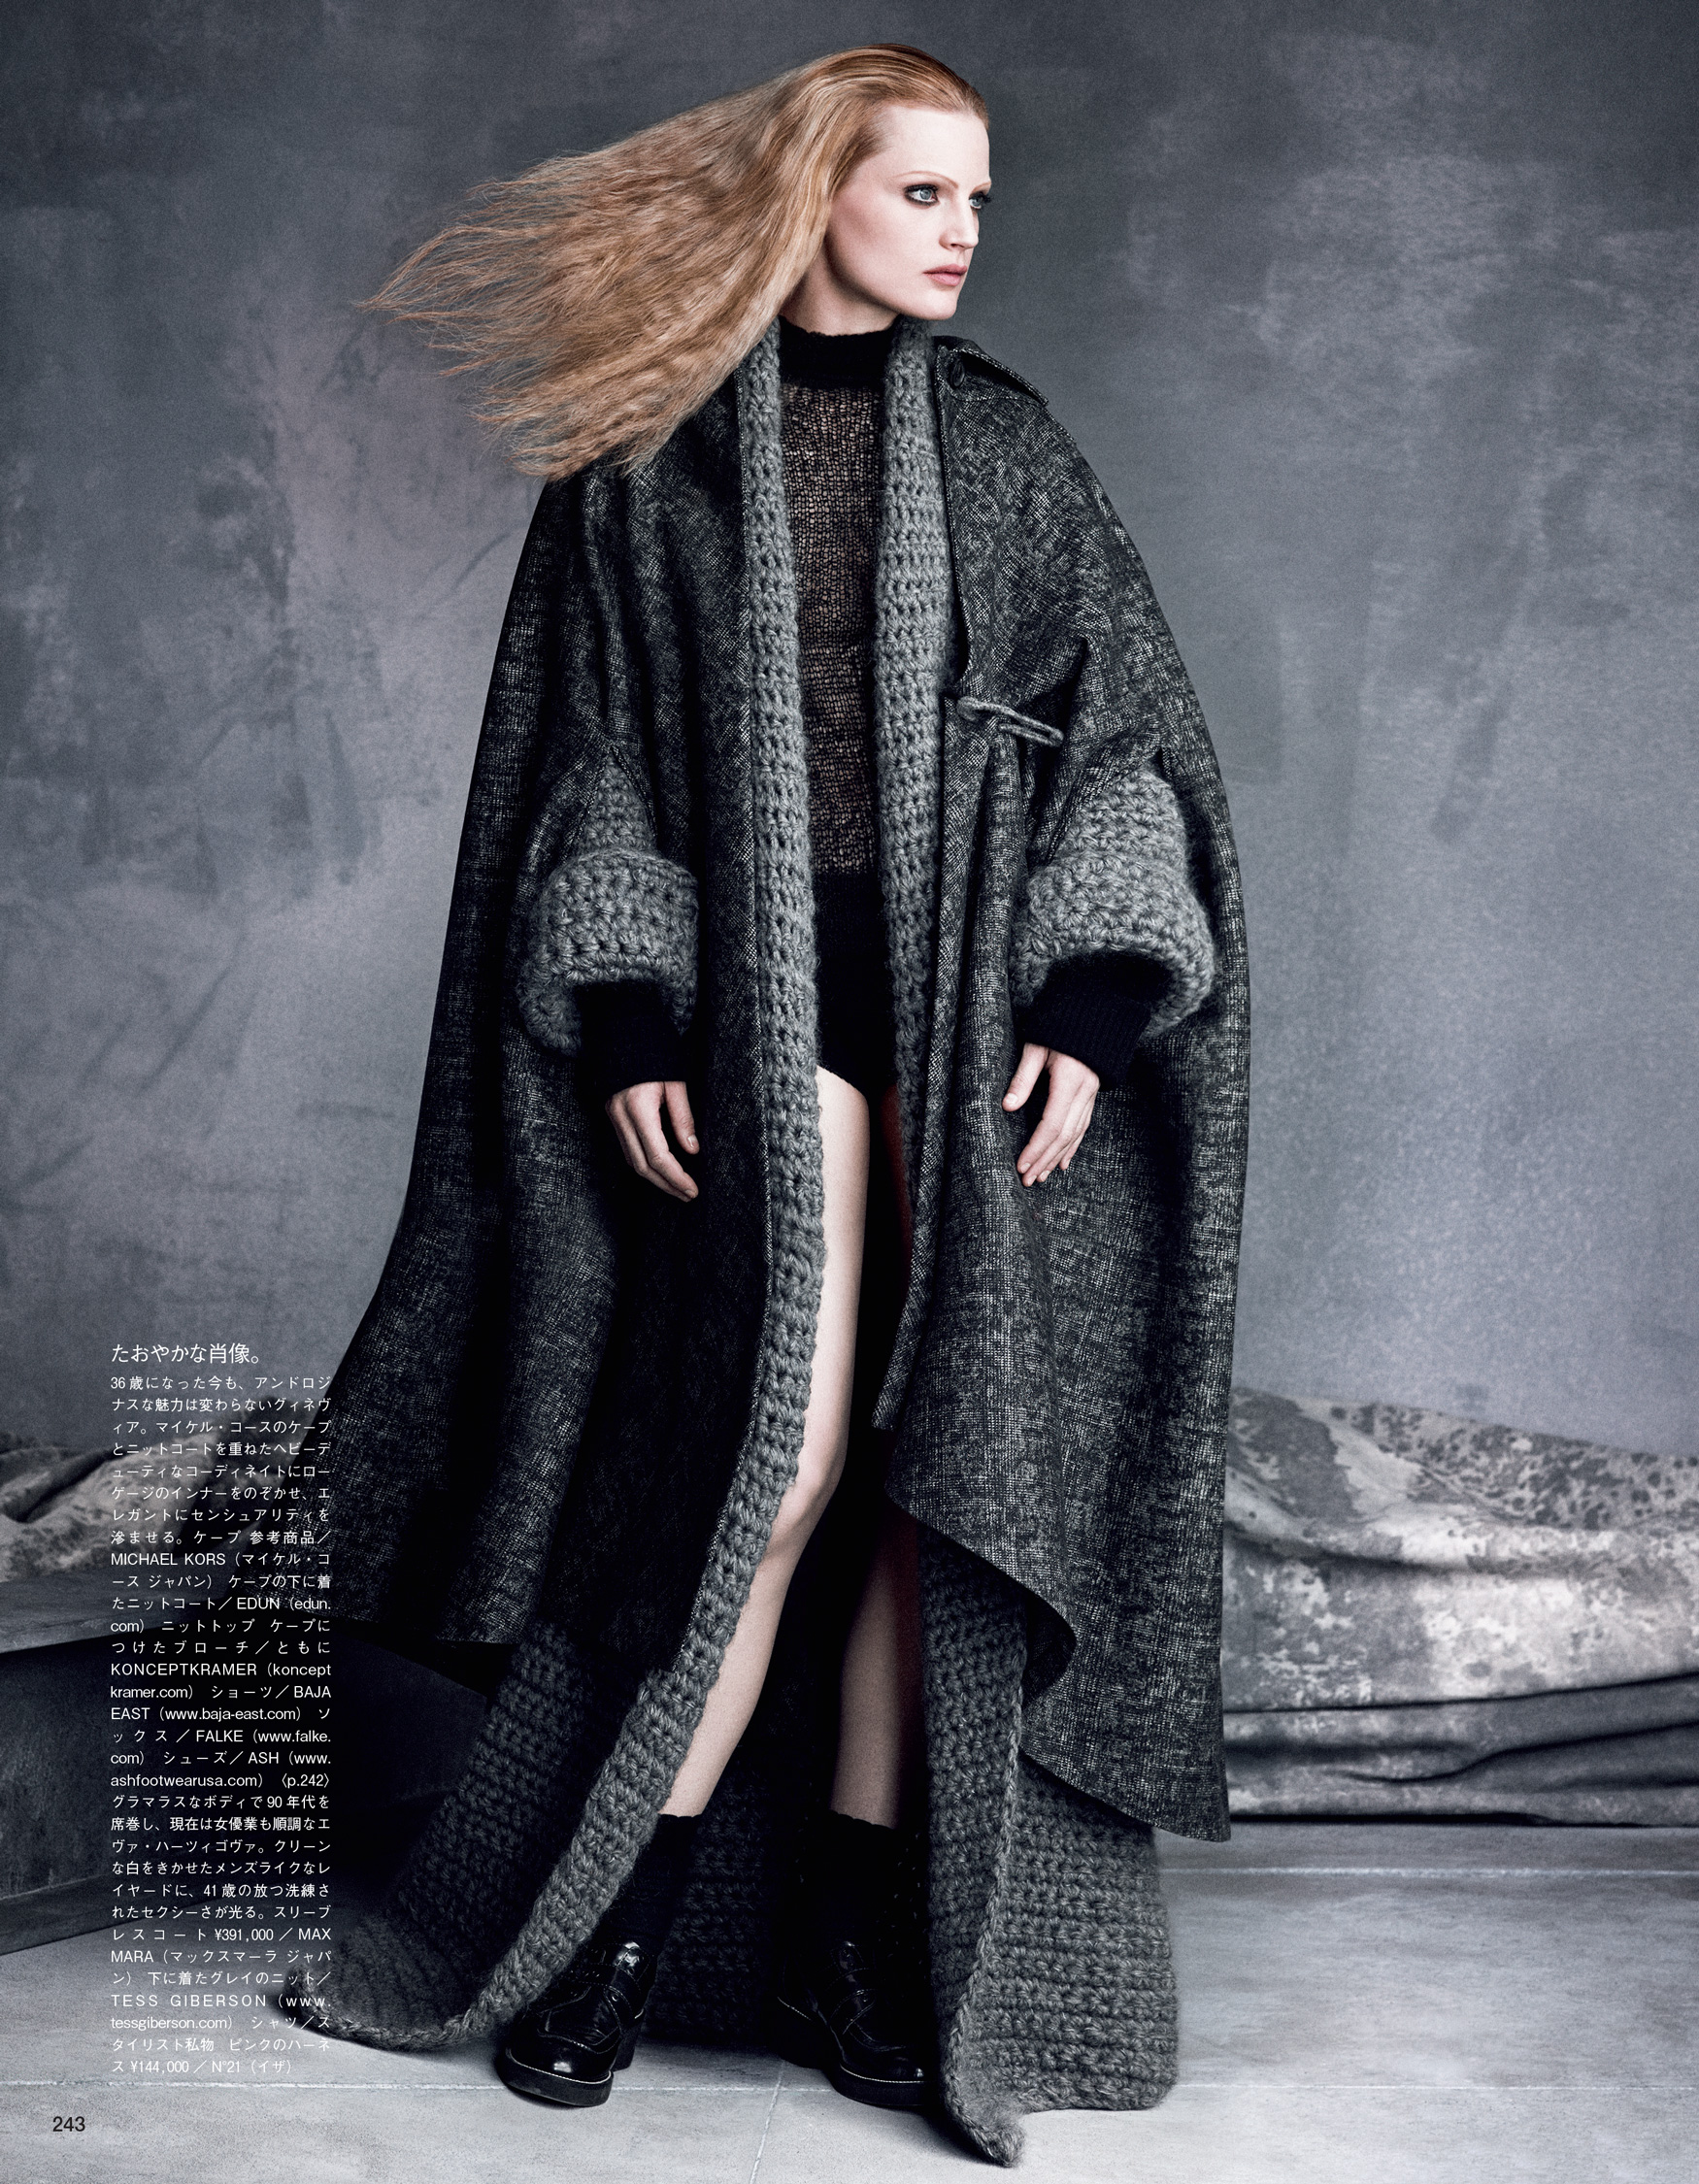 Giovanna-Battaglia-The-Icons-Of-Perfections-Vogue-Japan-15th-Anniversary-Issue-Luigi-Iango-V181_243_200-24.jpg